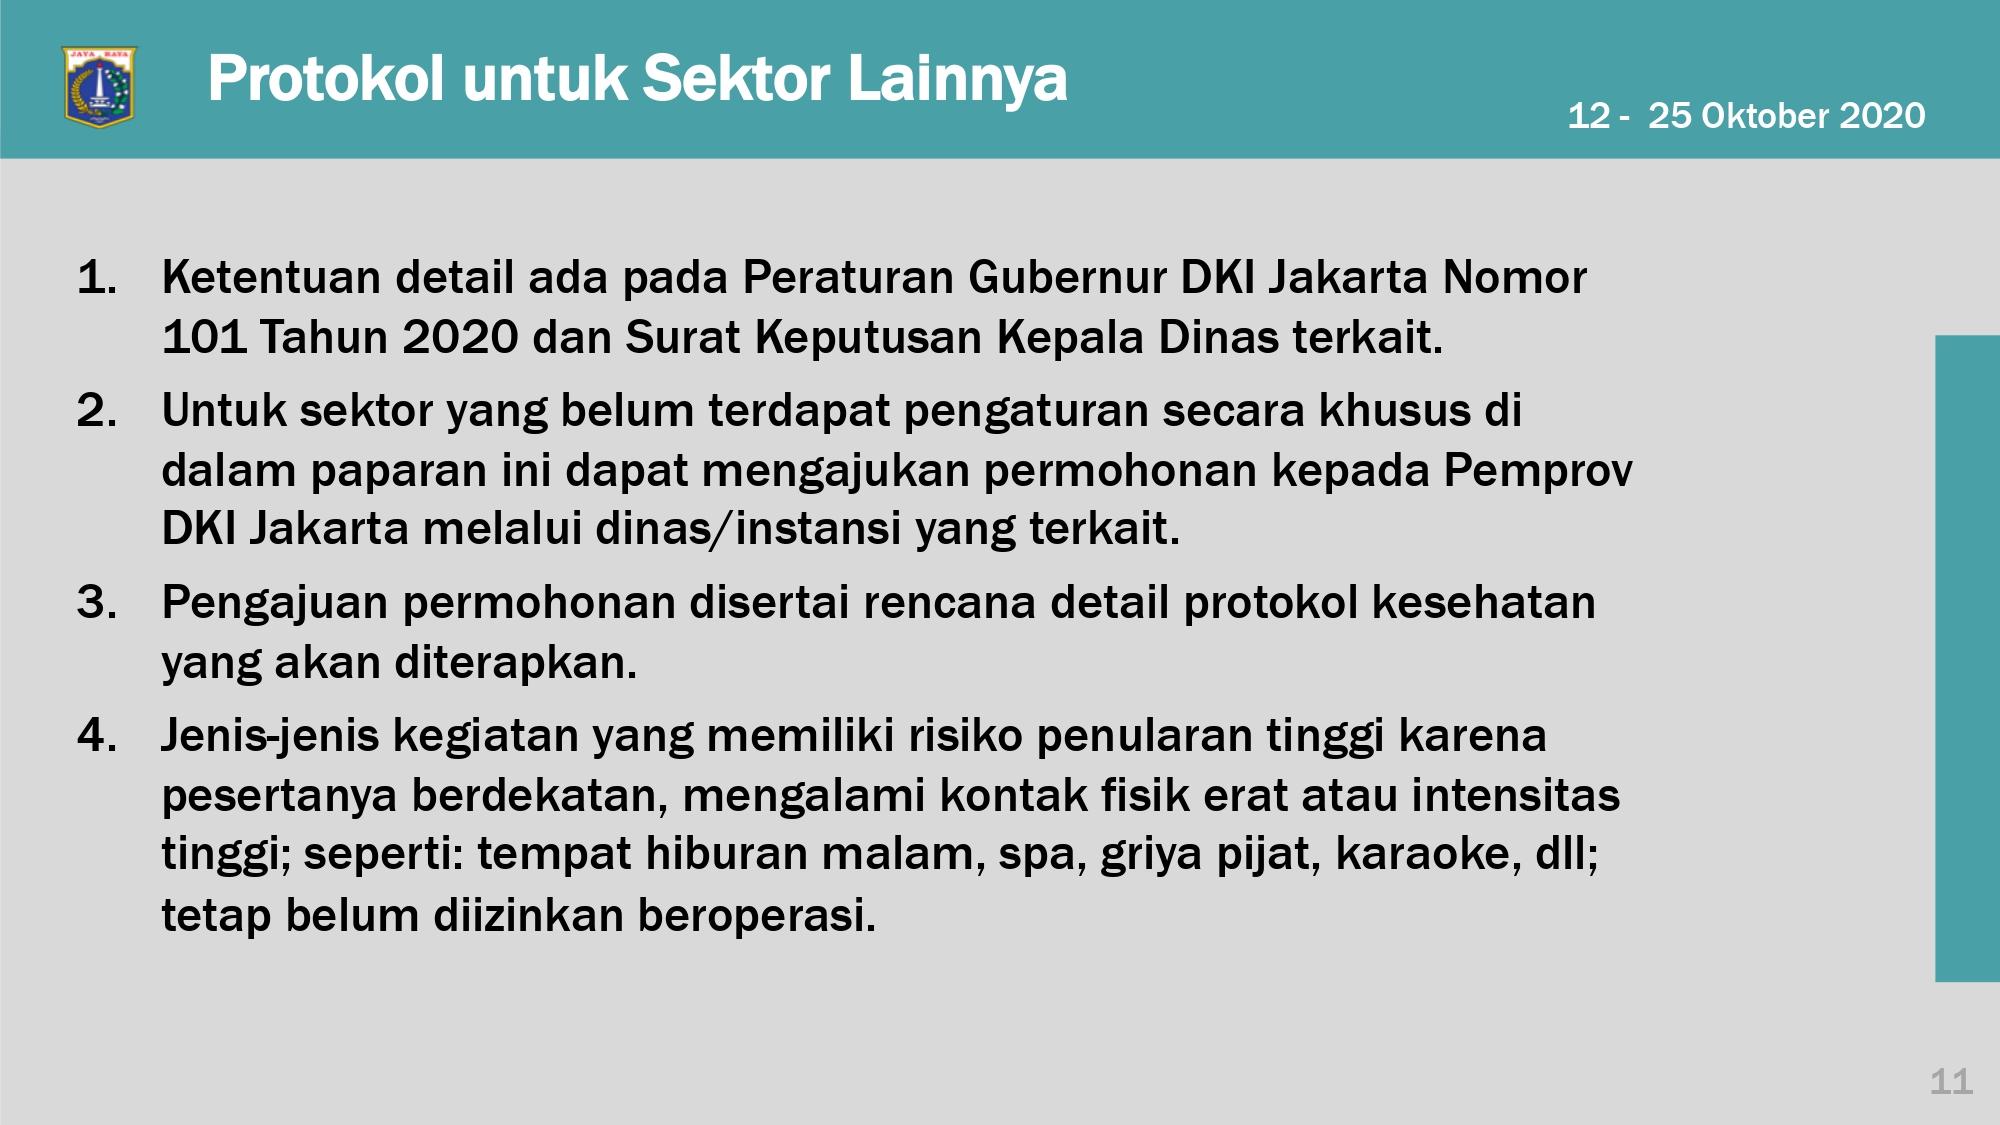 Pengaturan PSBB Transisi DKI Jakarta 12-25 Oktober 2020_page-0011